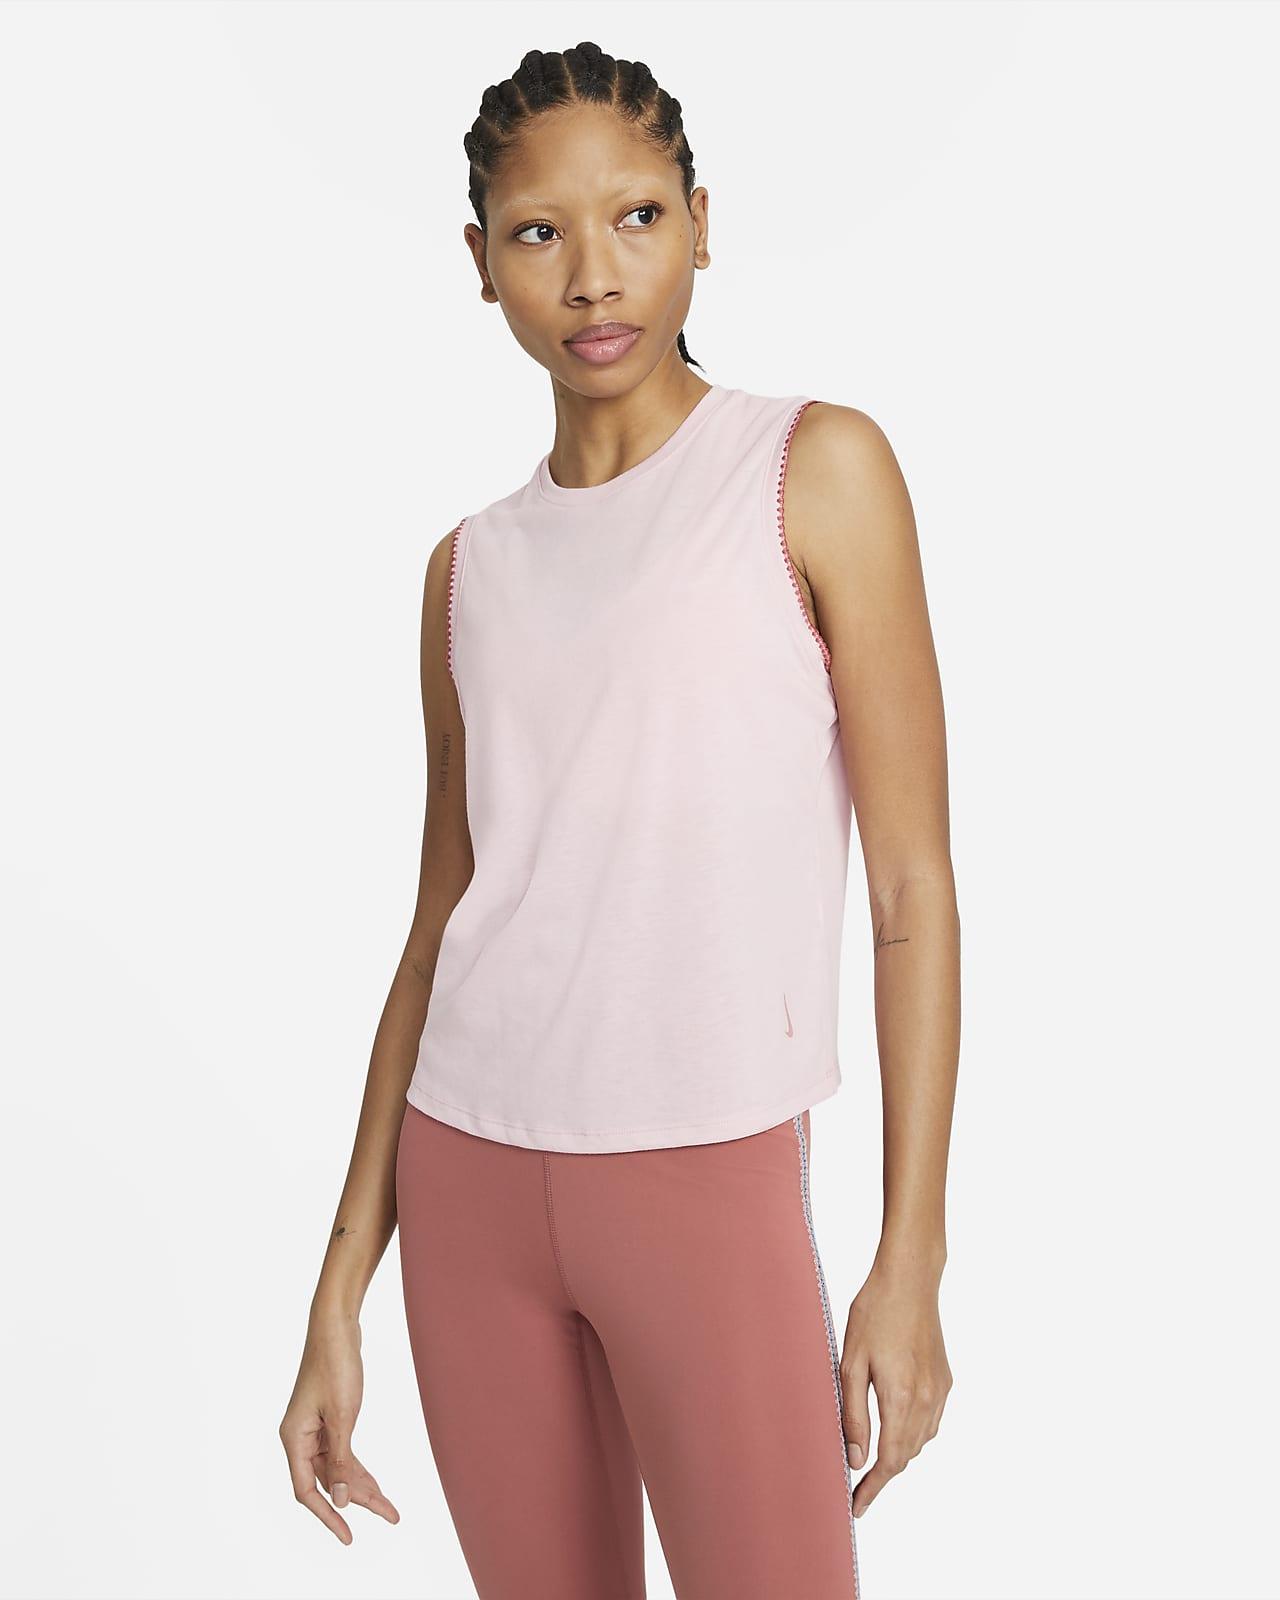 Camiseta de tirantes con orilla de encaje para mujer de Nike Yoga